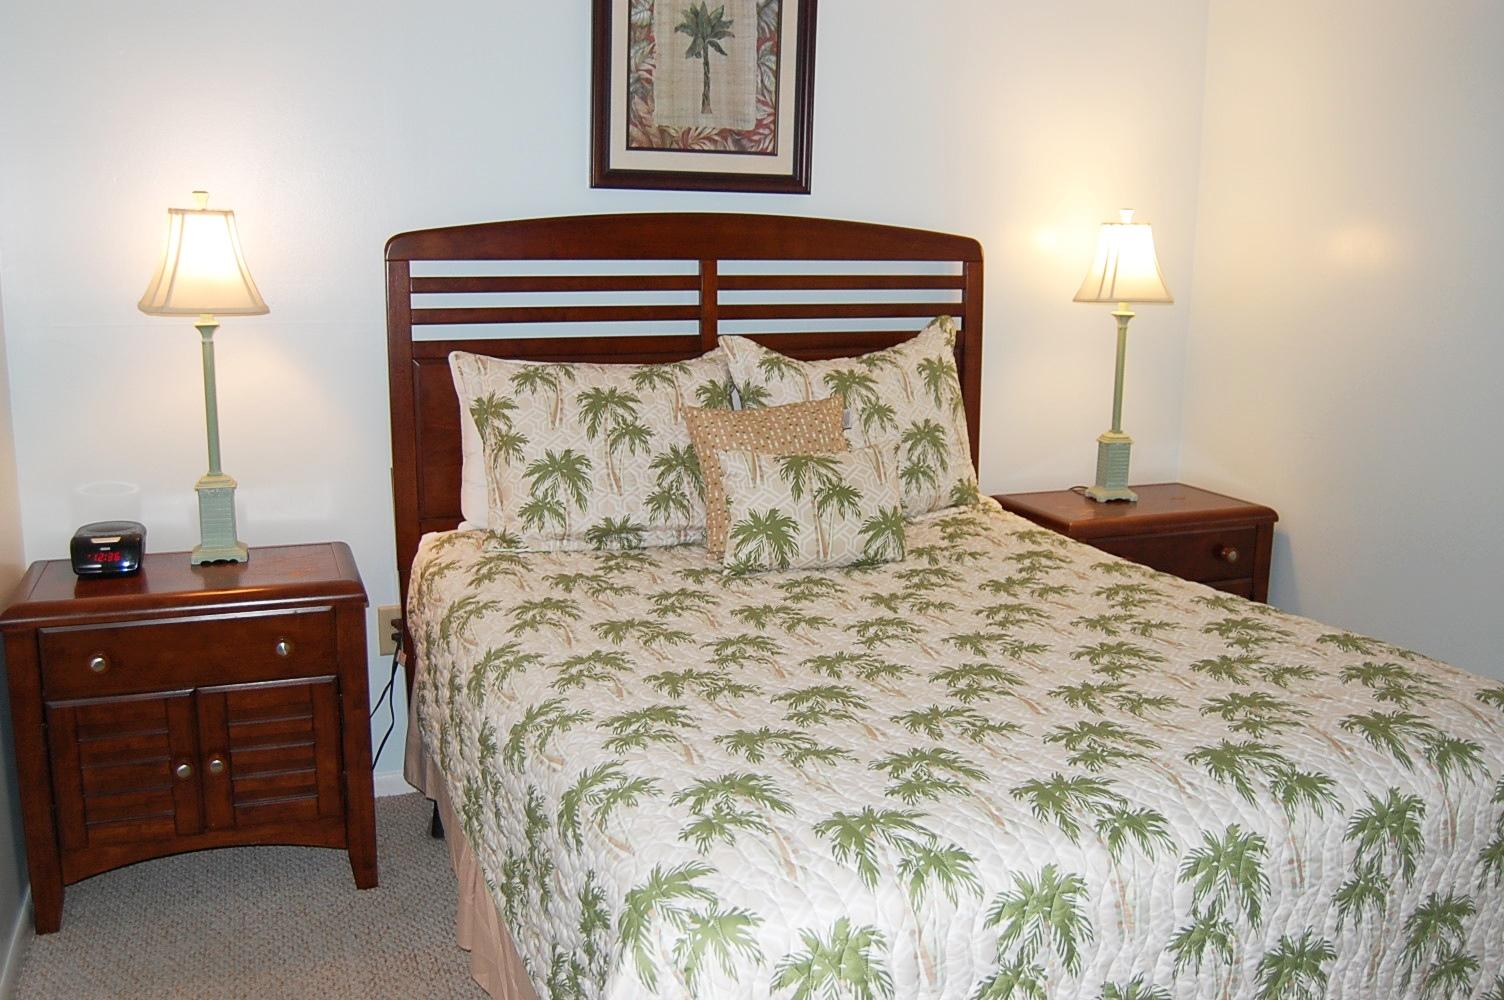 Island Winds West 177 Condo rental in Island Winds West in Gulf Shores Alabama - #21